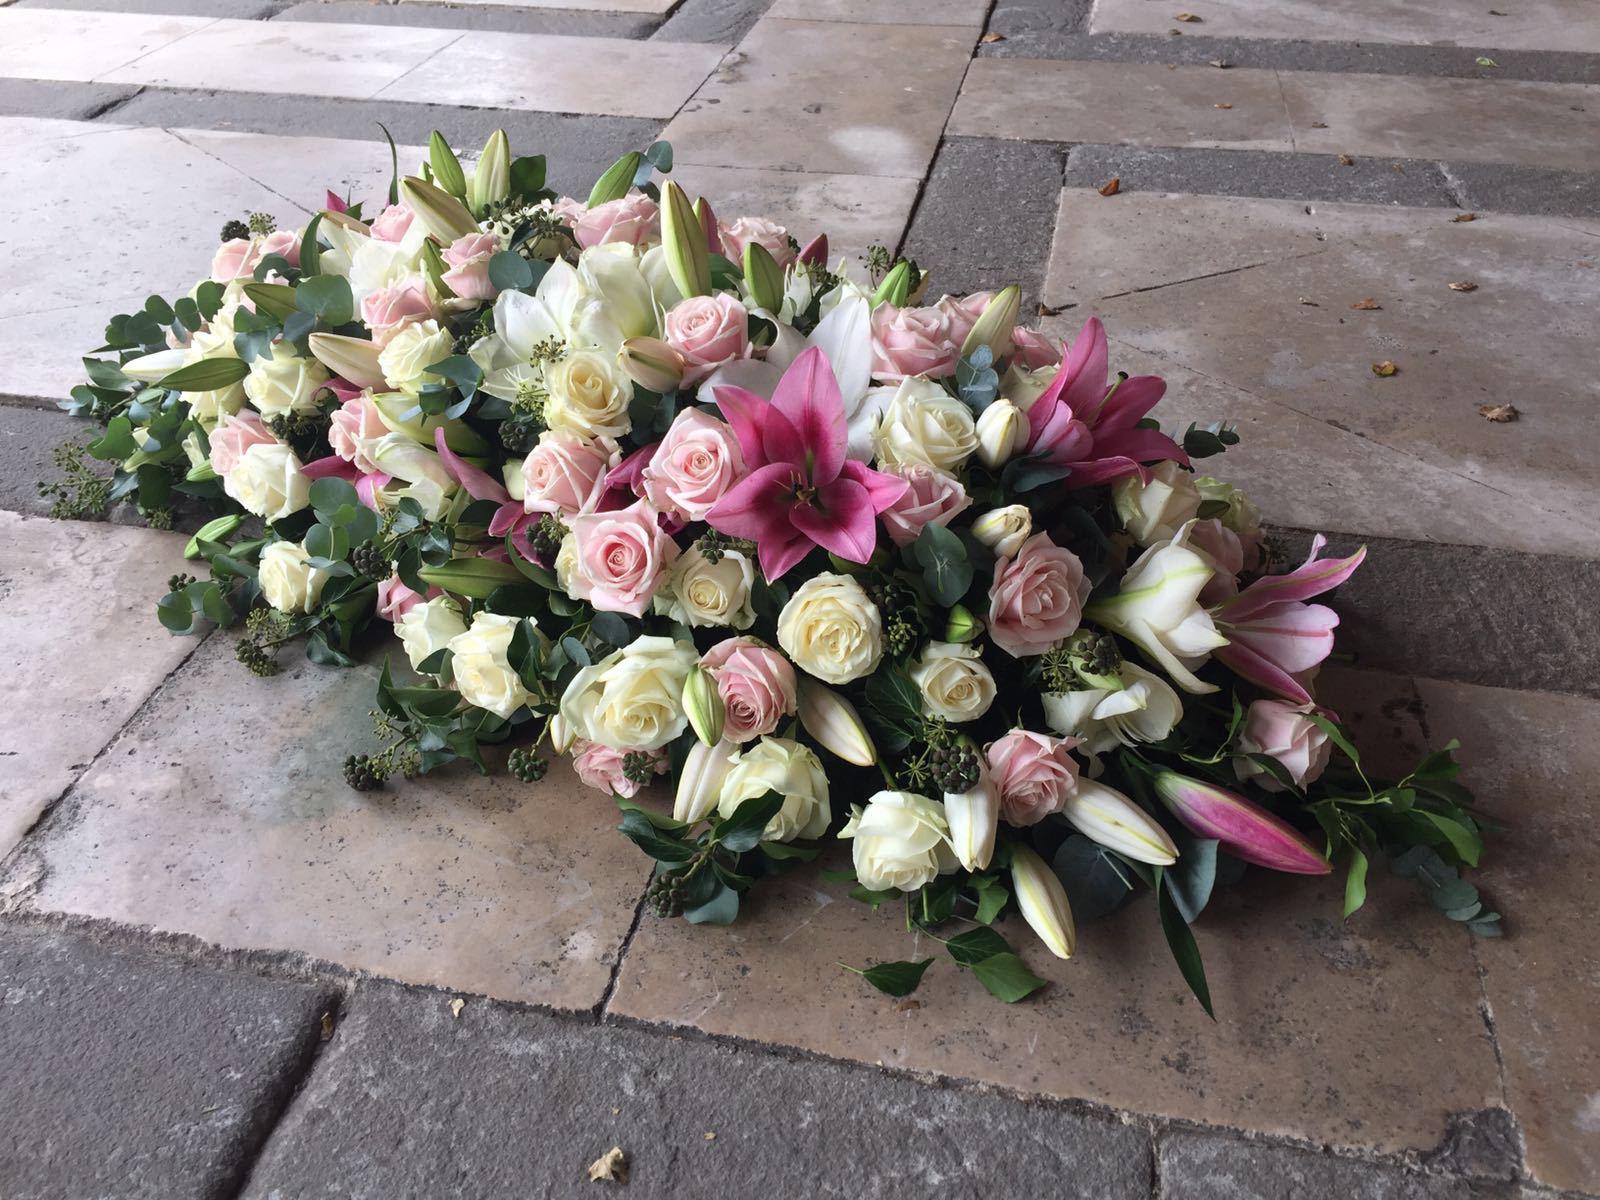 Funeral Flowers Surrey